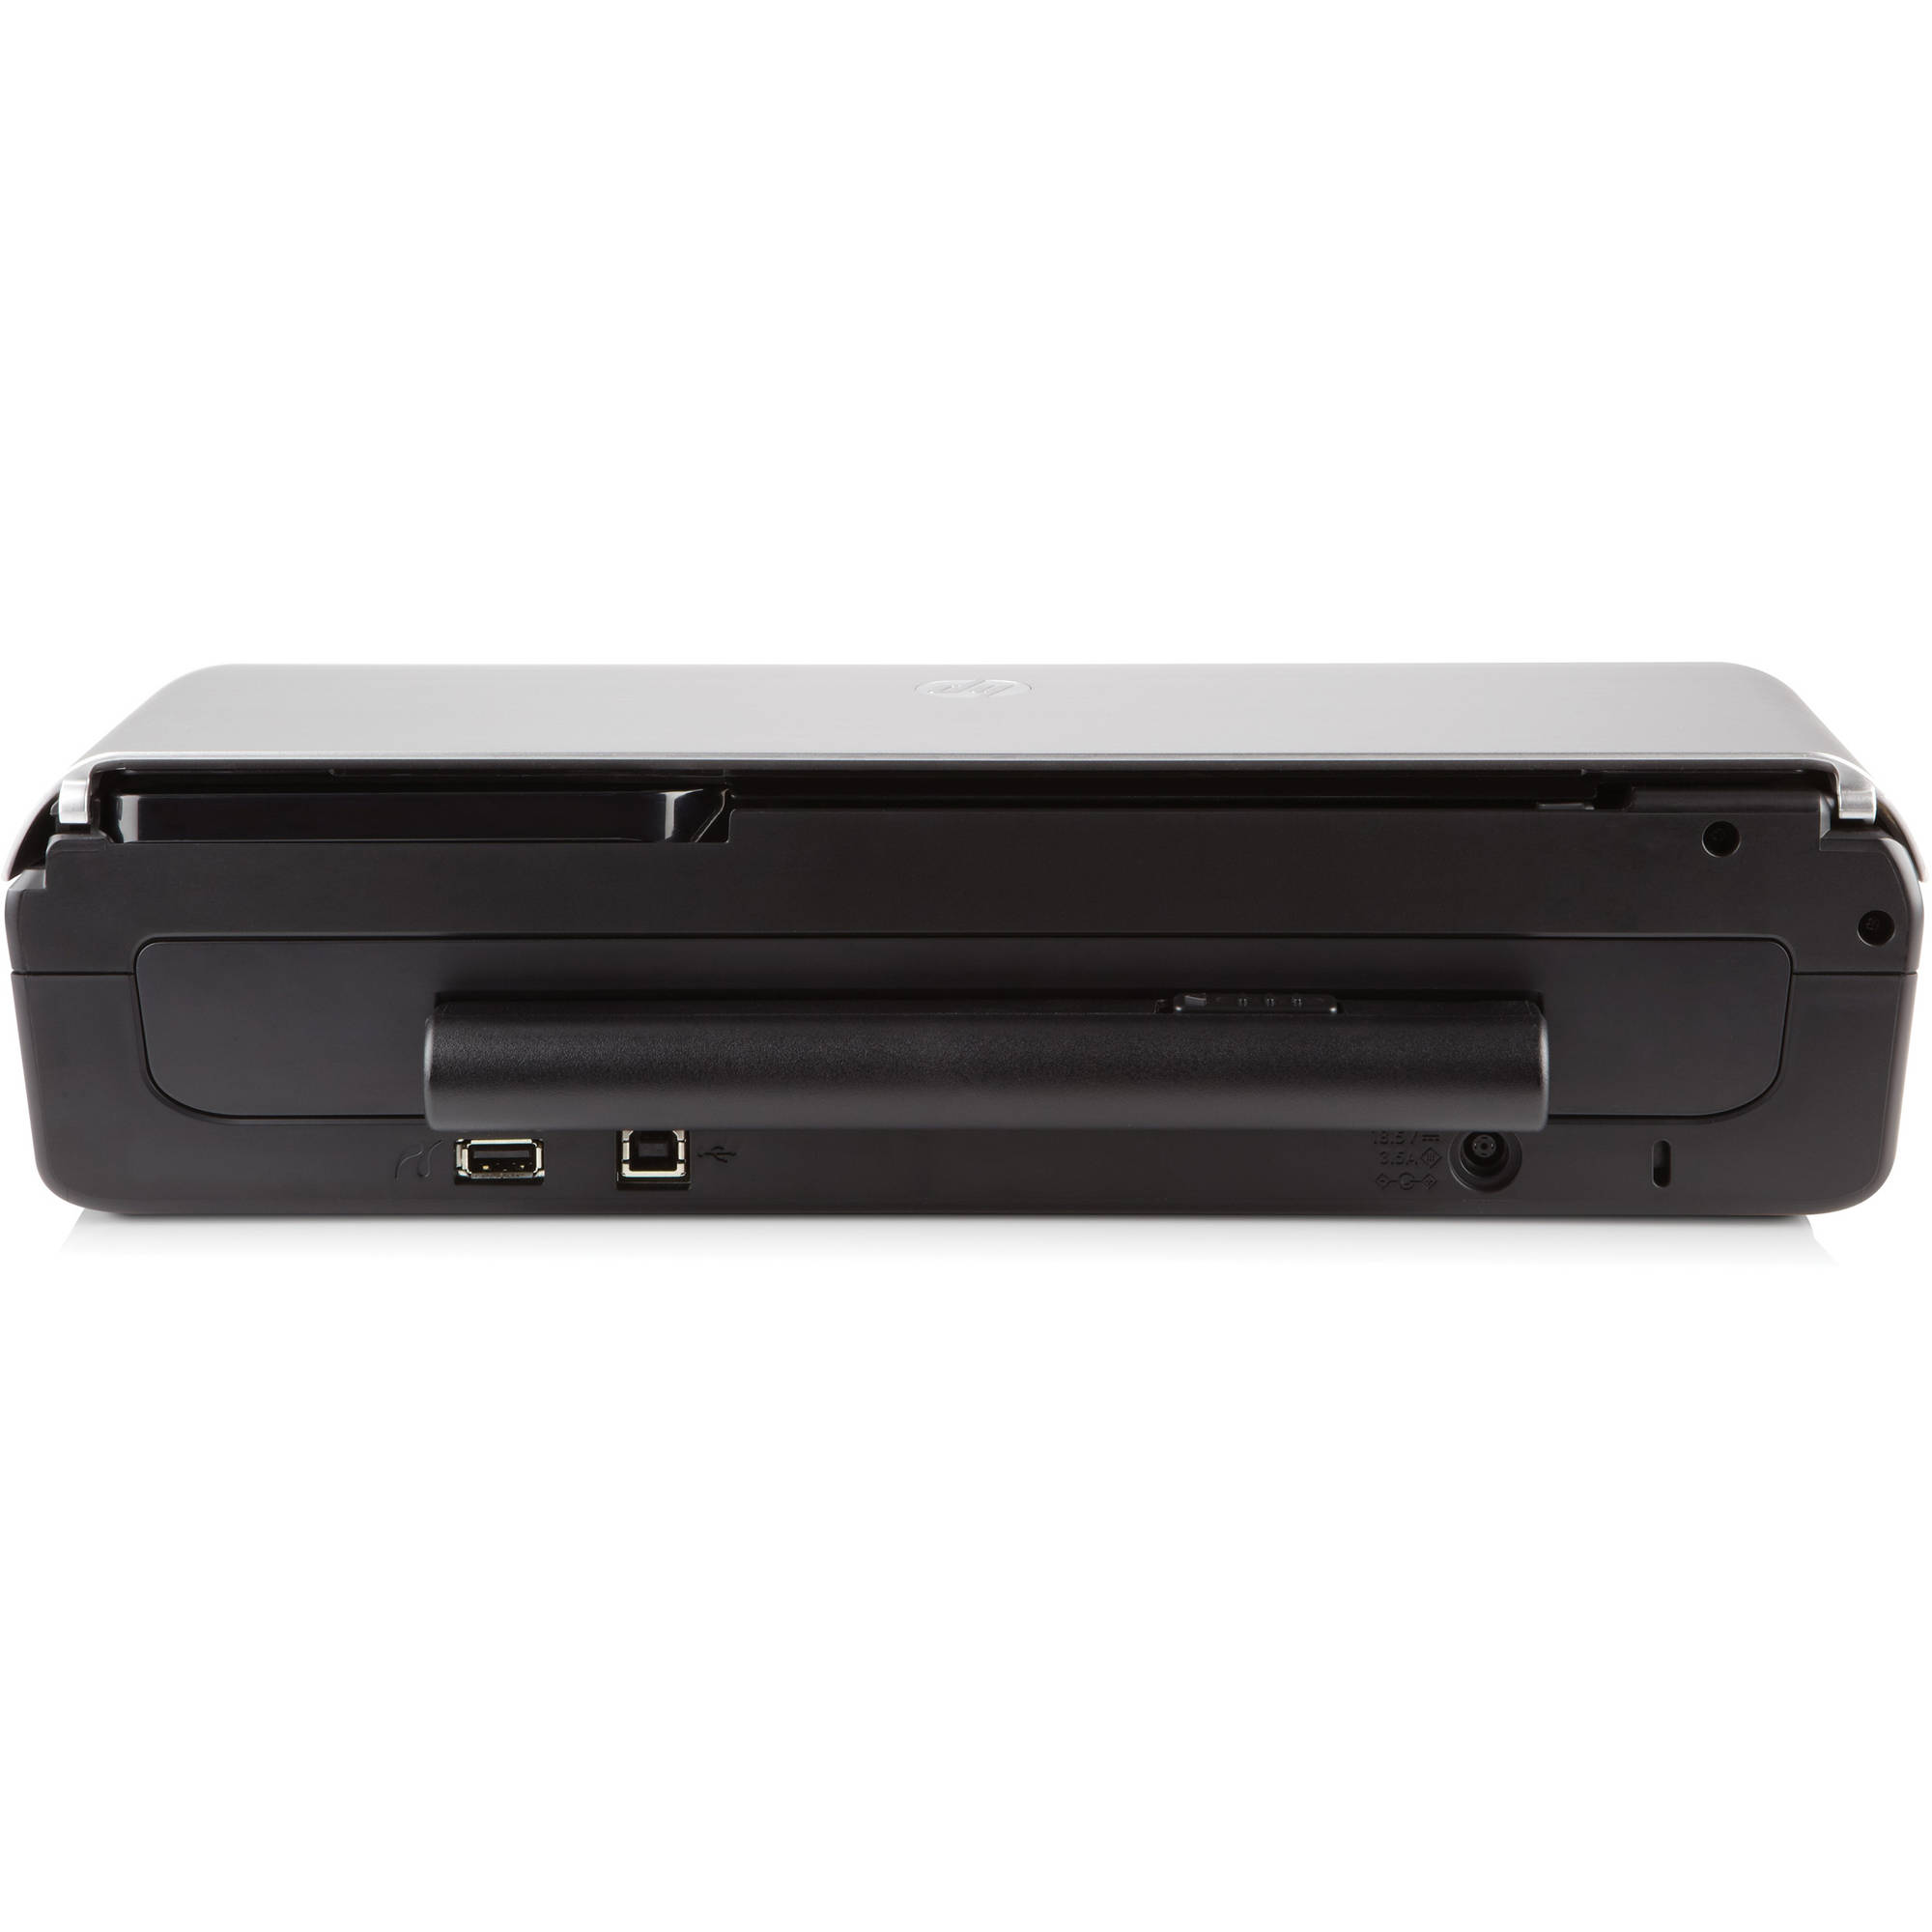 Hp Officejet 150 Mobile Color All In One Inkjet Printer